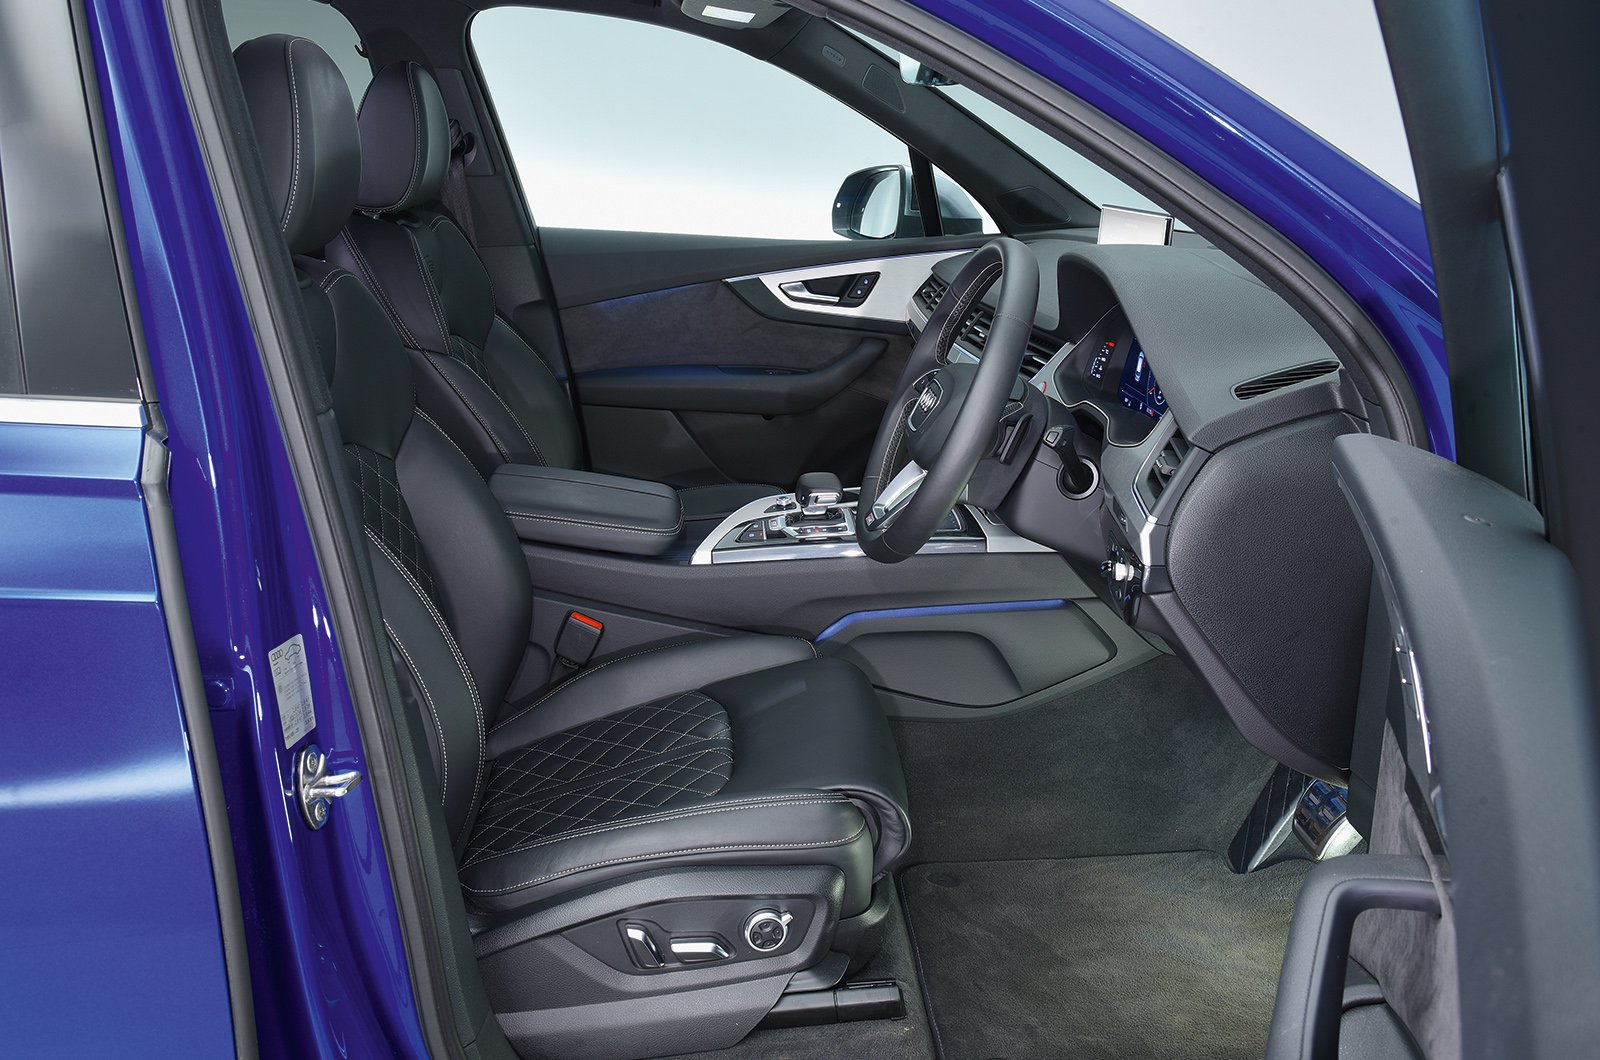 Audi SQ7 front seat